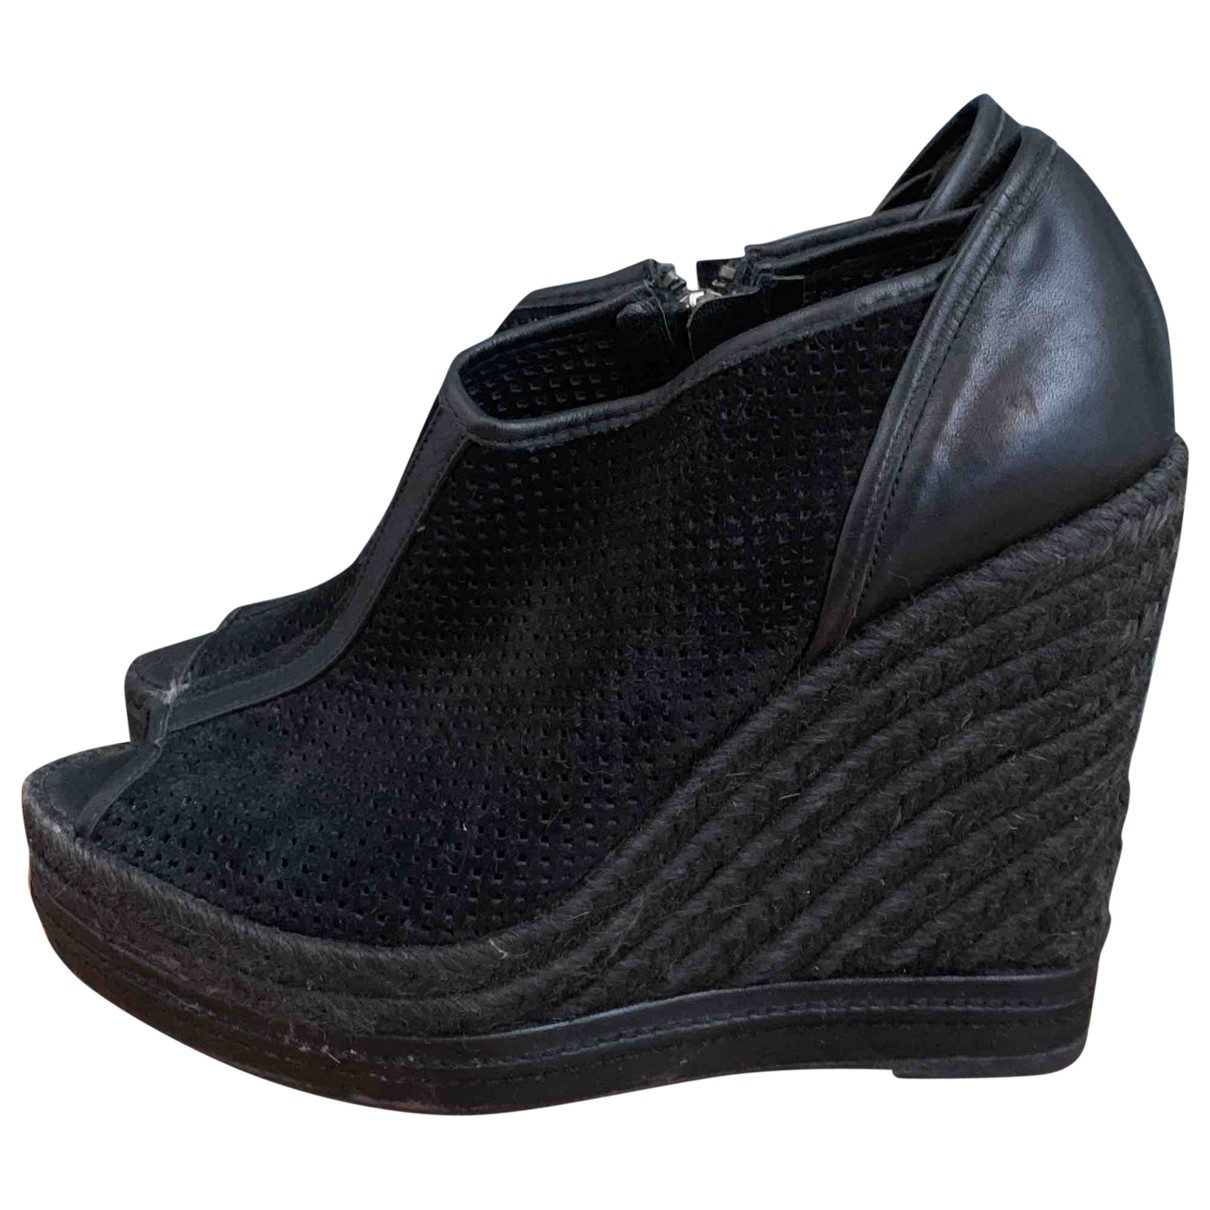 The Kooples \N Black Leather Espadrilles for Women 39 EU